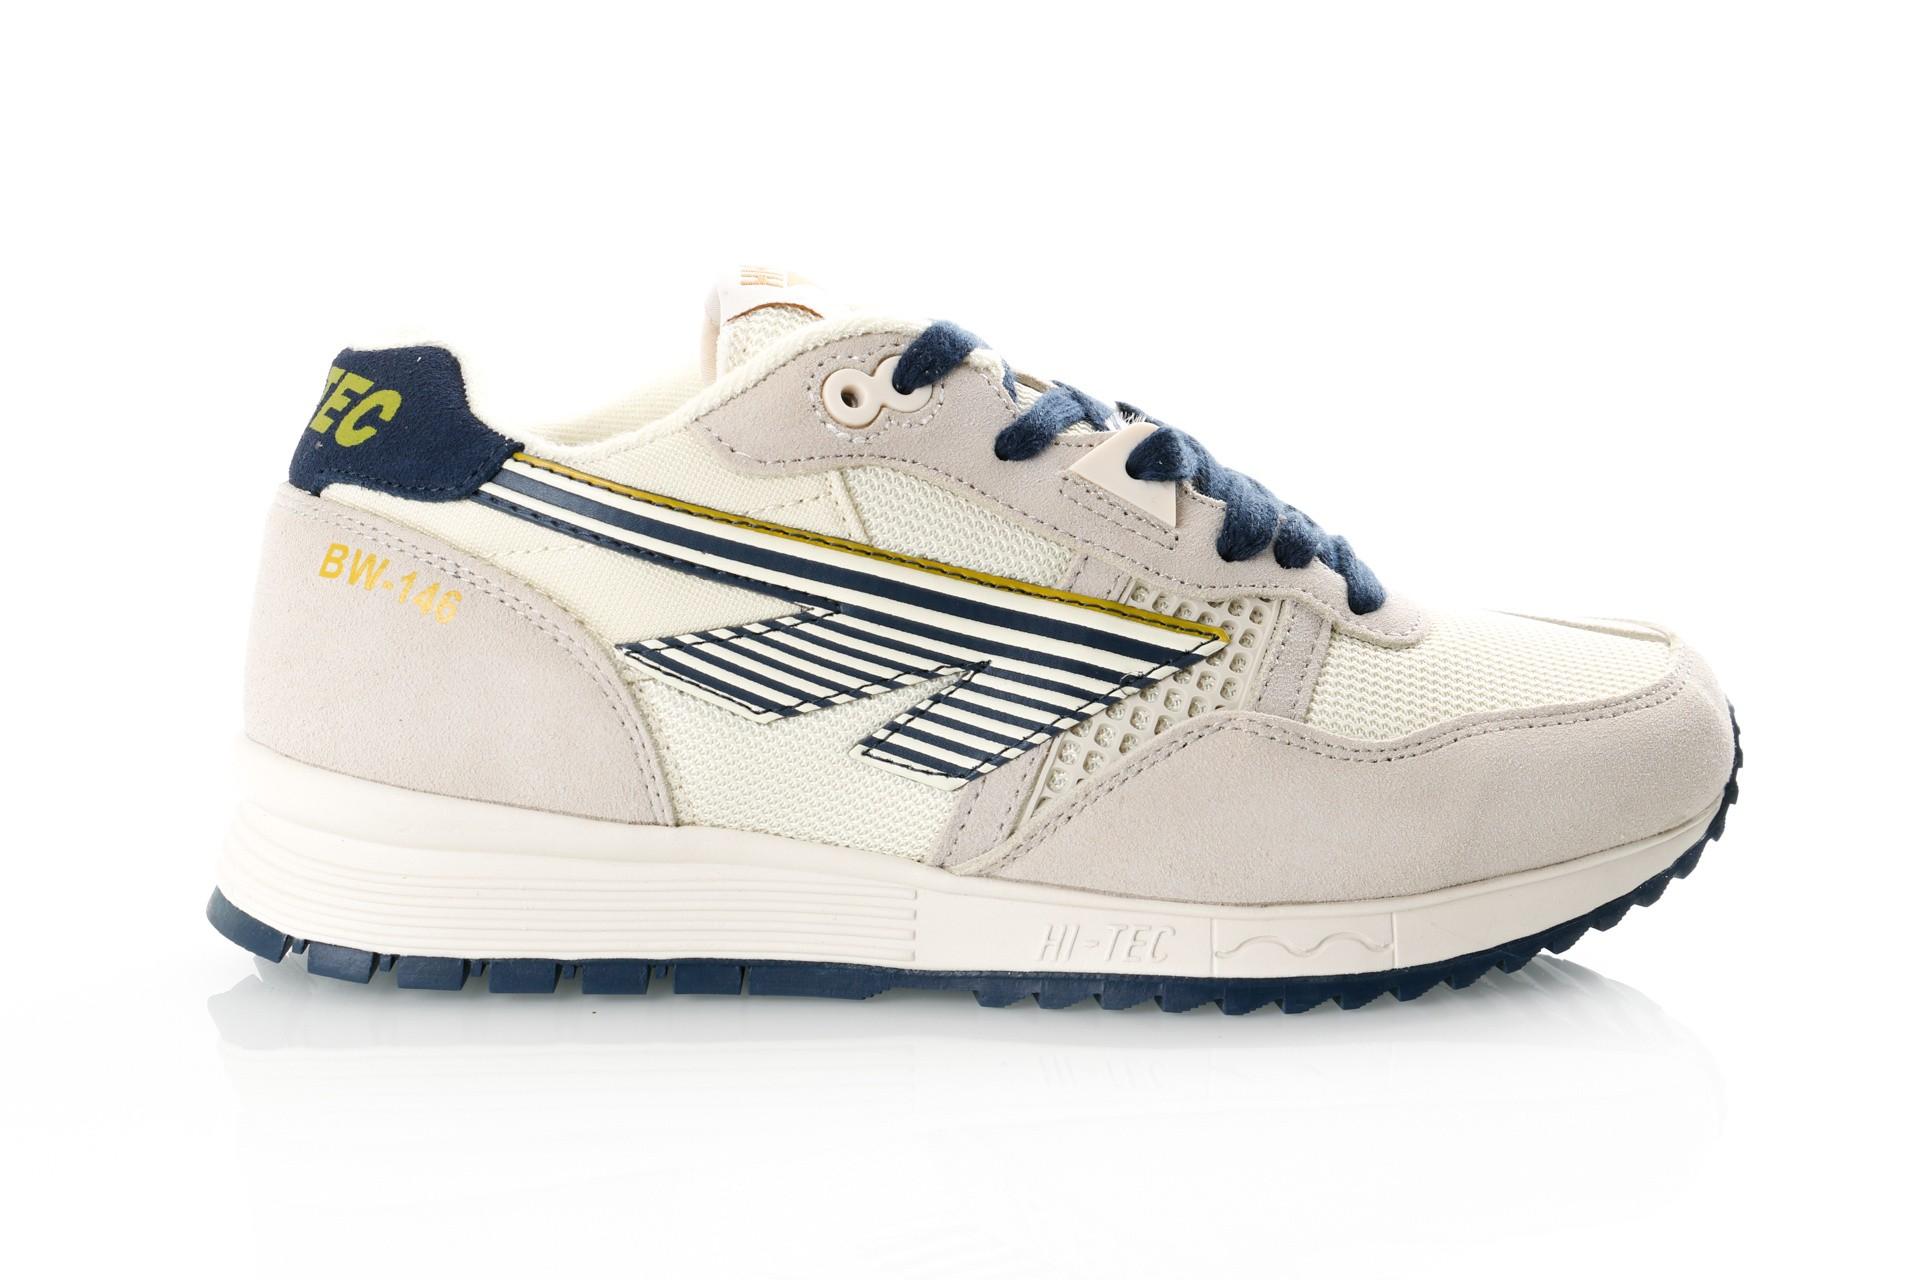 Foto van Hi-Tec Bw 146 S010002/011 Sneakers Off White/Navy/Gold